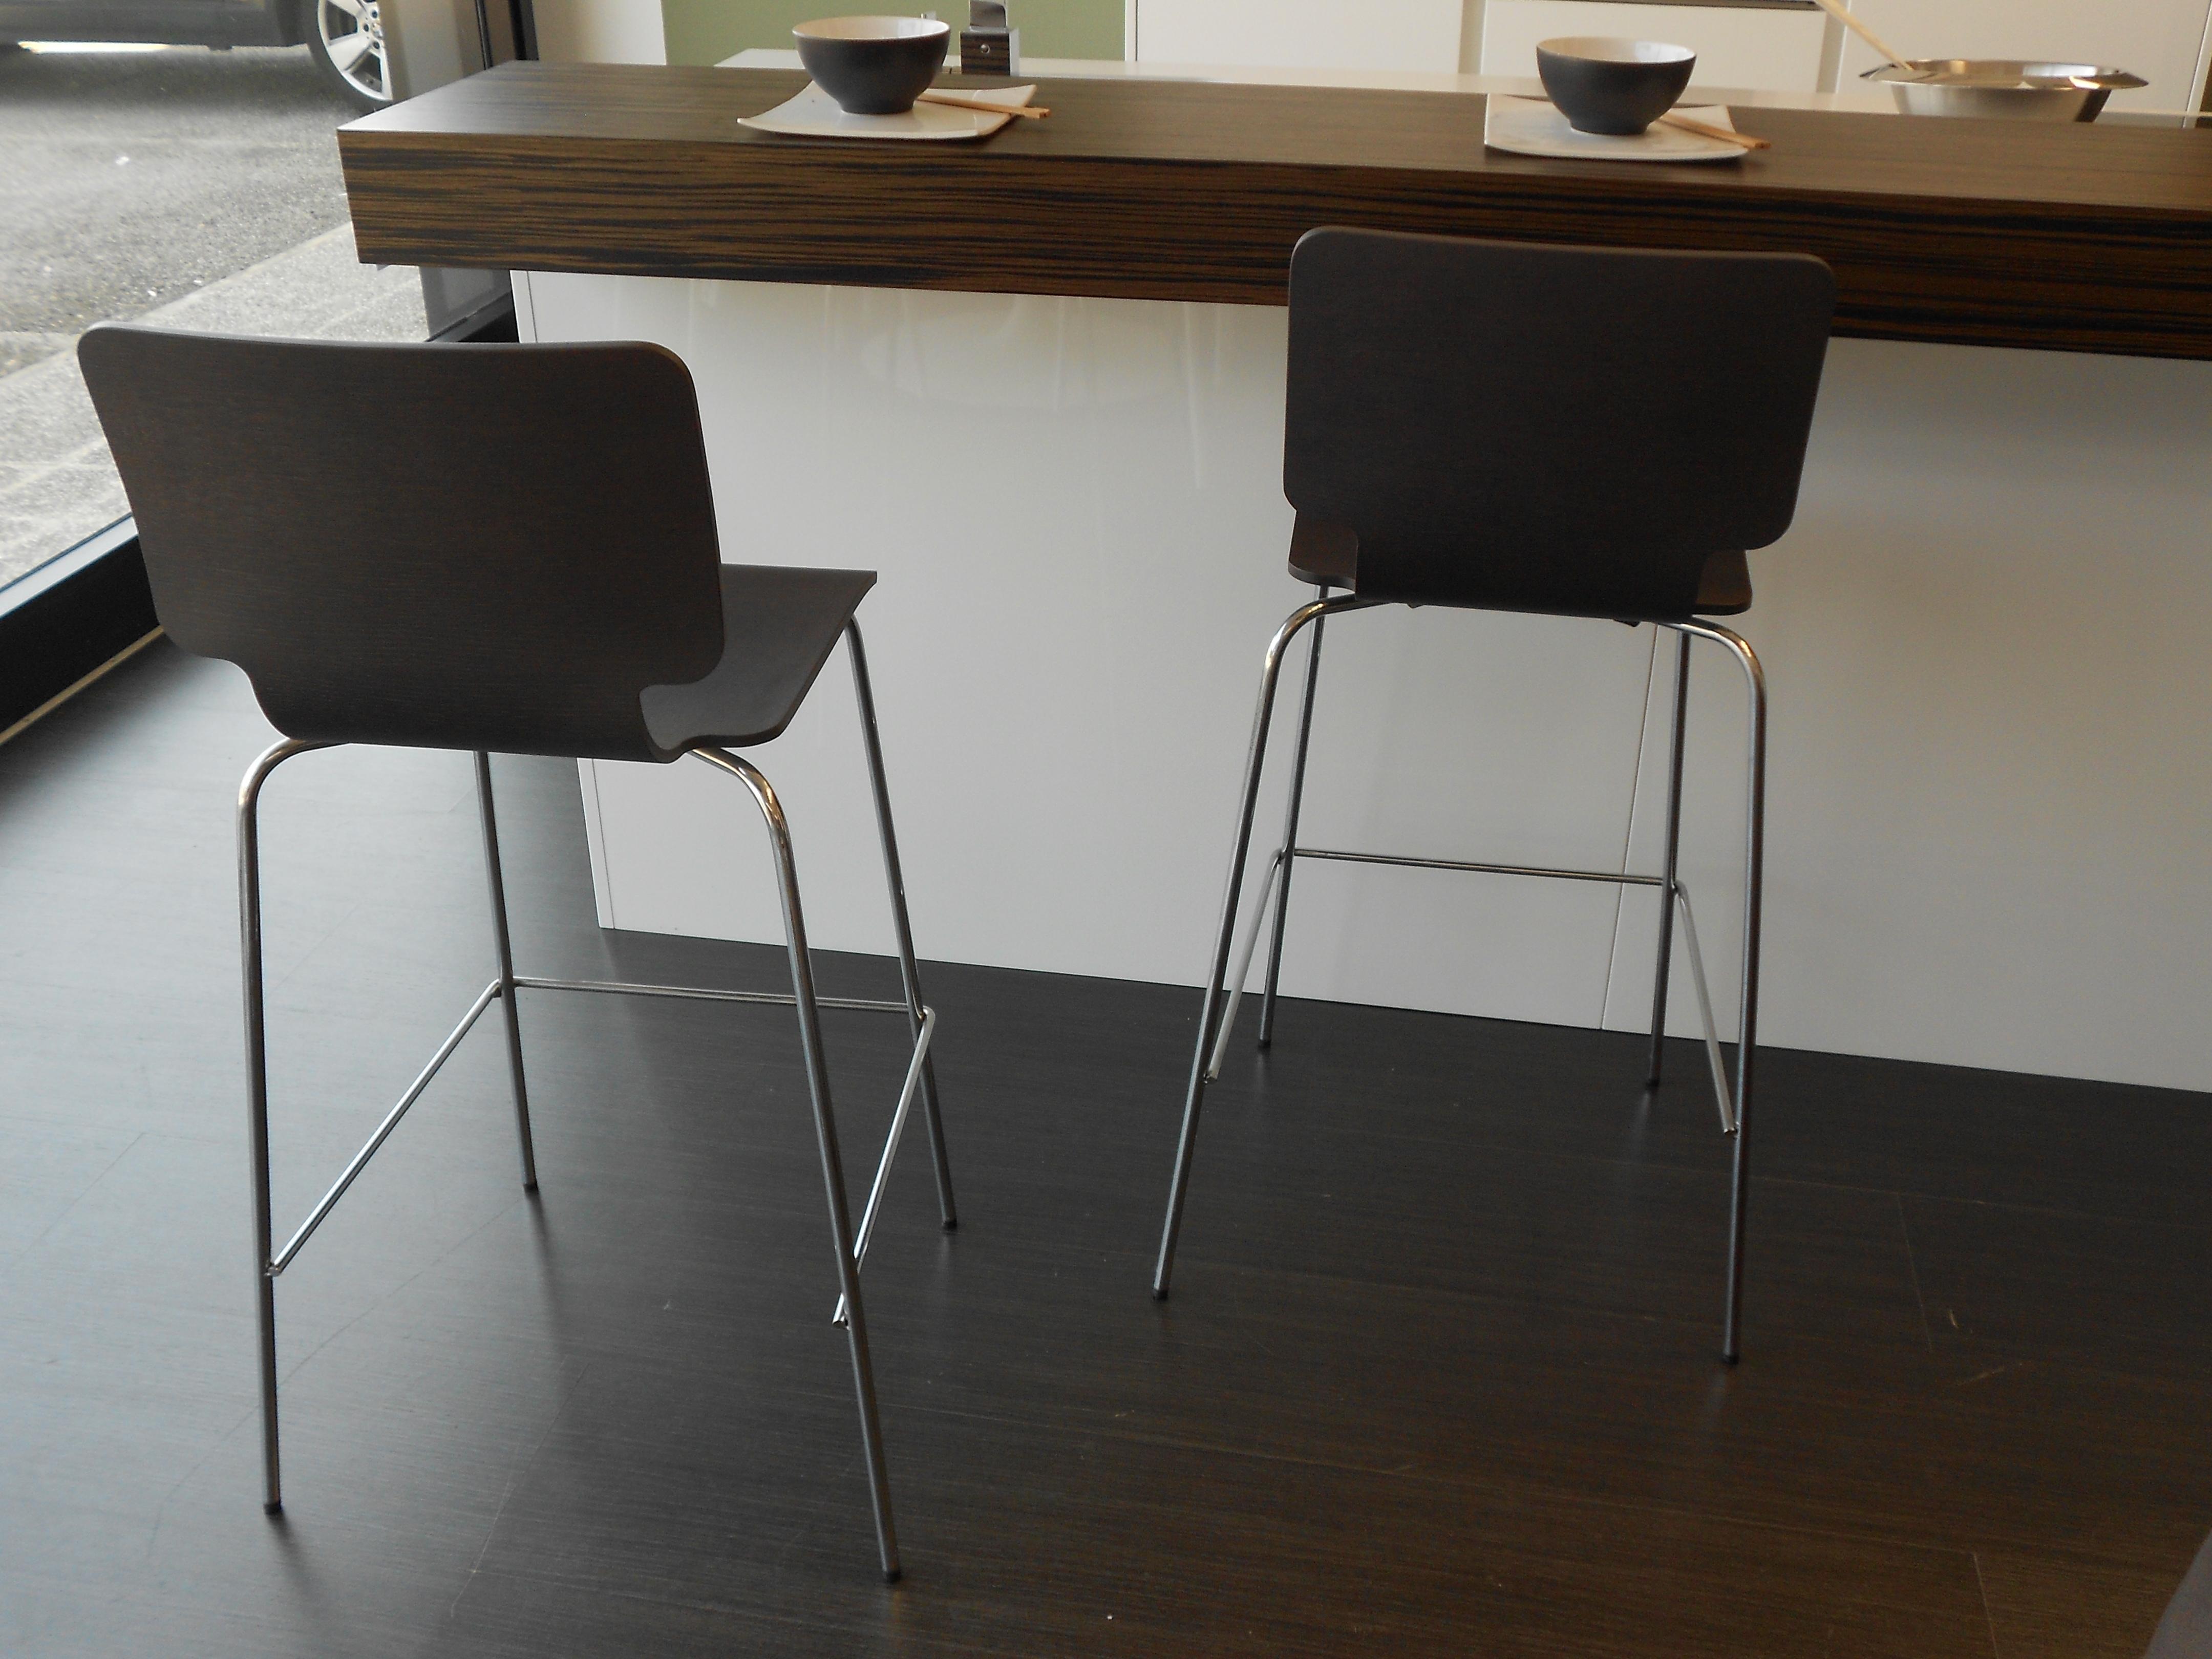 Sgabelli cucina pedrali scontati del sedie a prezzi